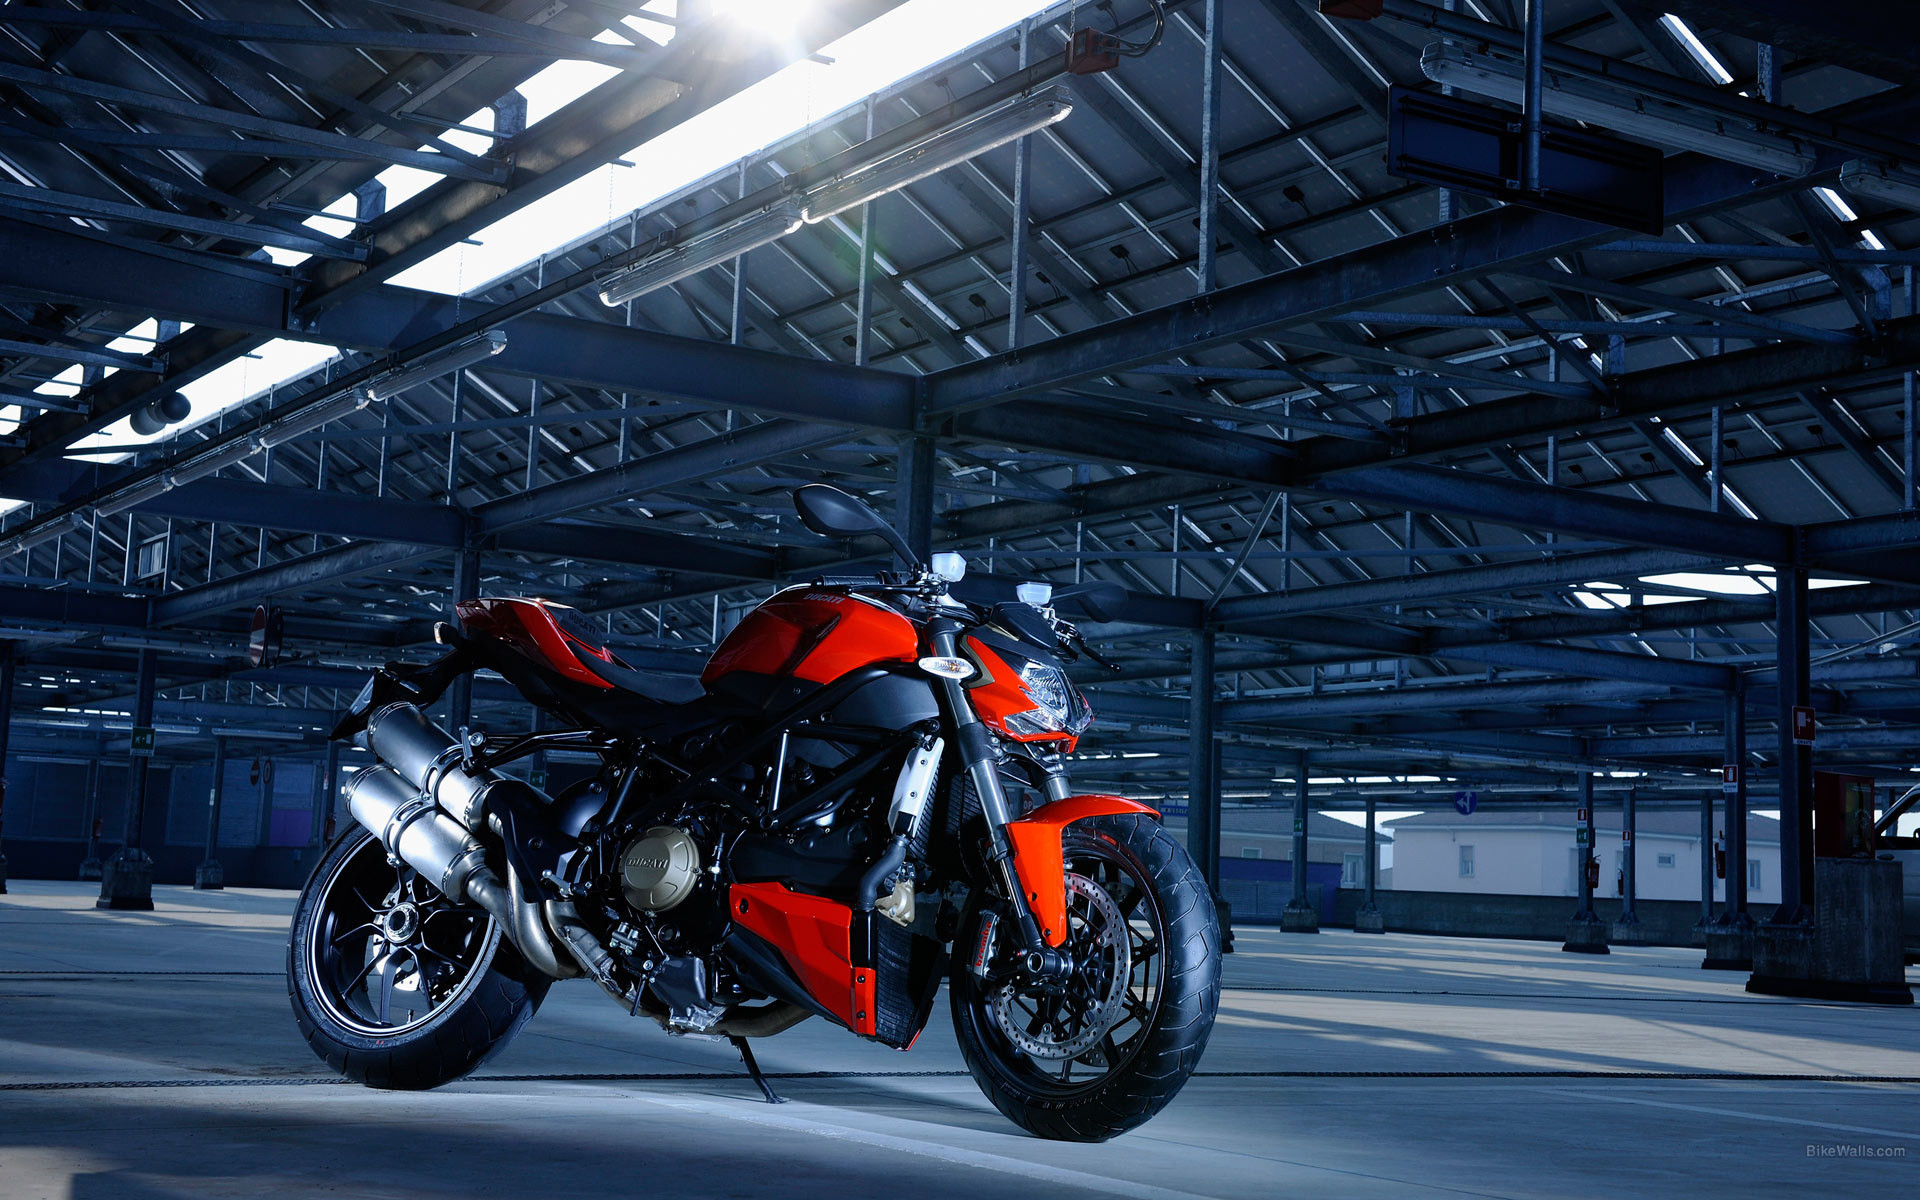 2000x1422 Black Suzuki Hayabusa HD Wallpaper Sportbike Superbike